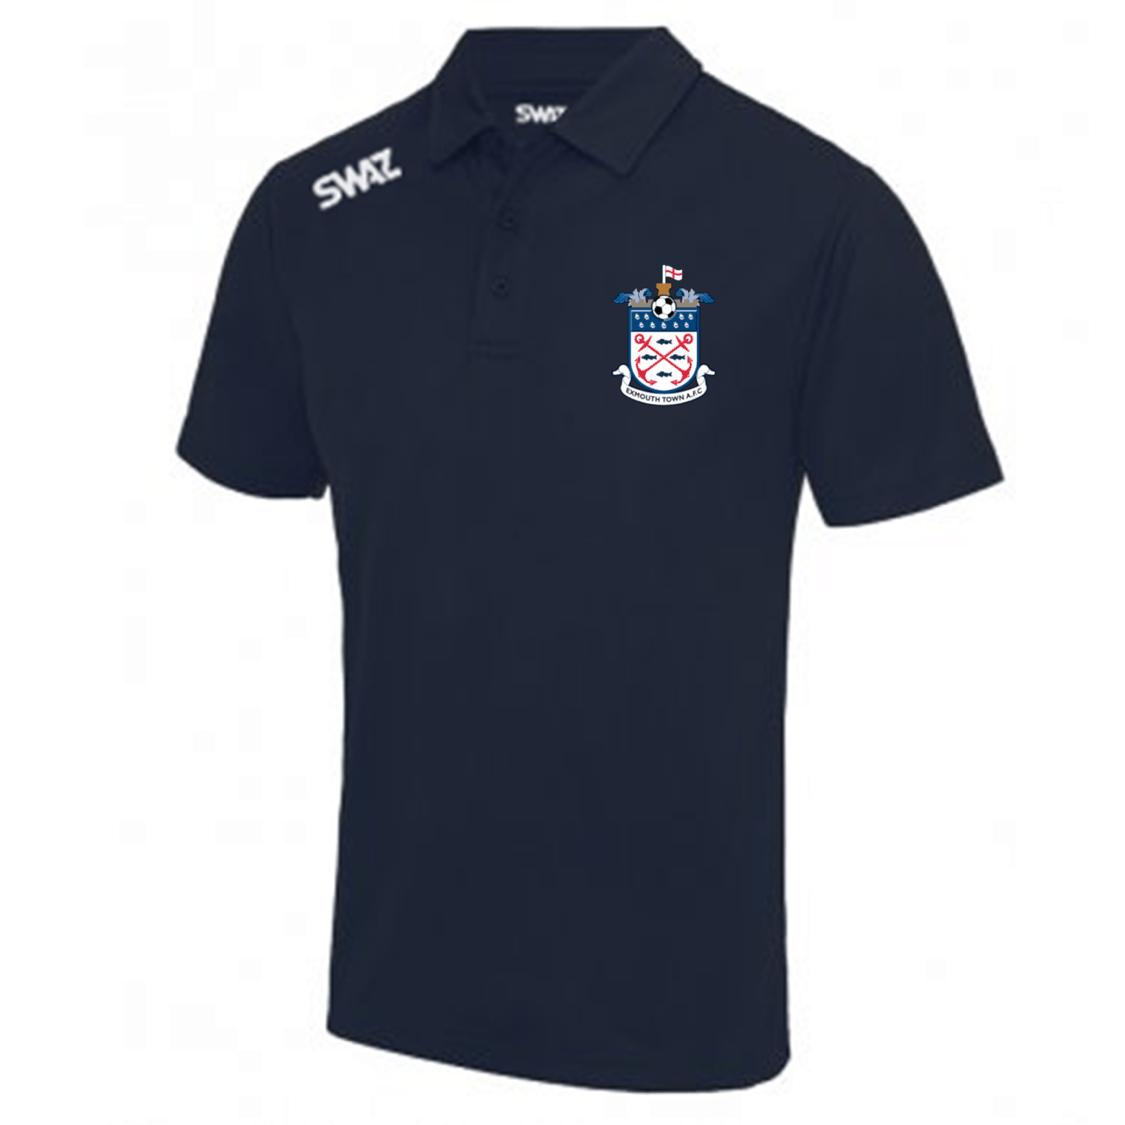 Exmouth Town Youth Polo   SWAZ Teamwear   Football Kit Supplier